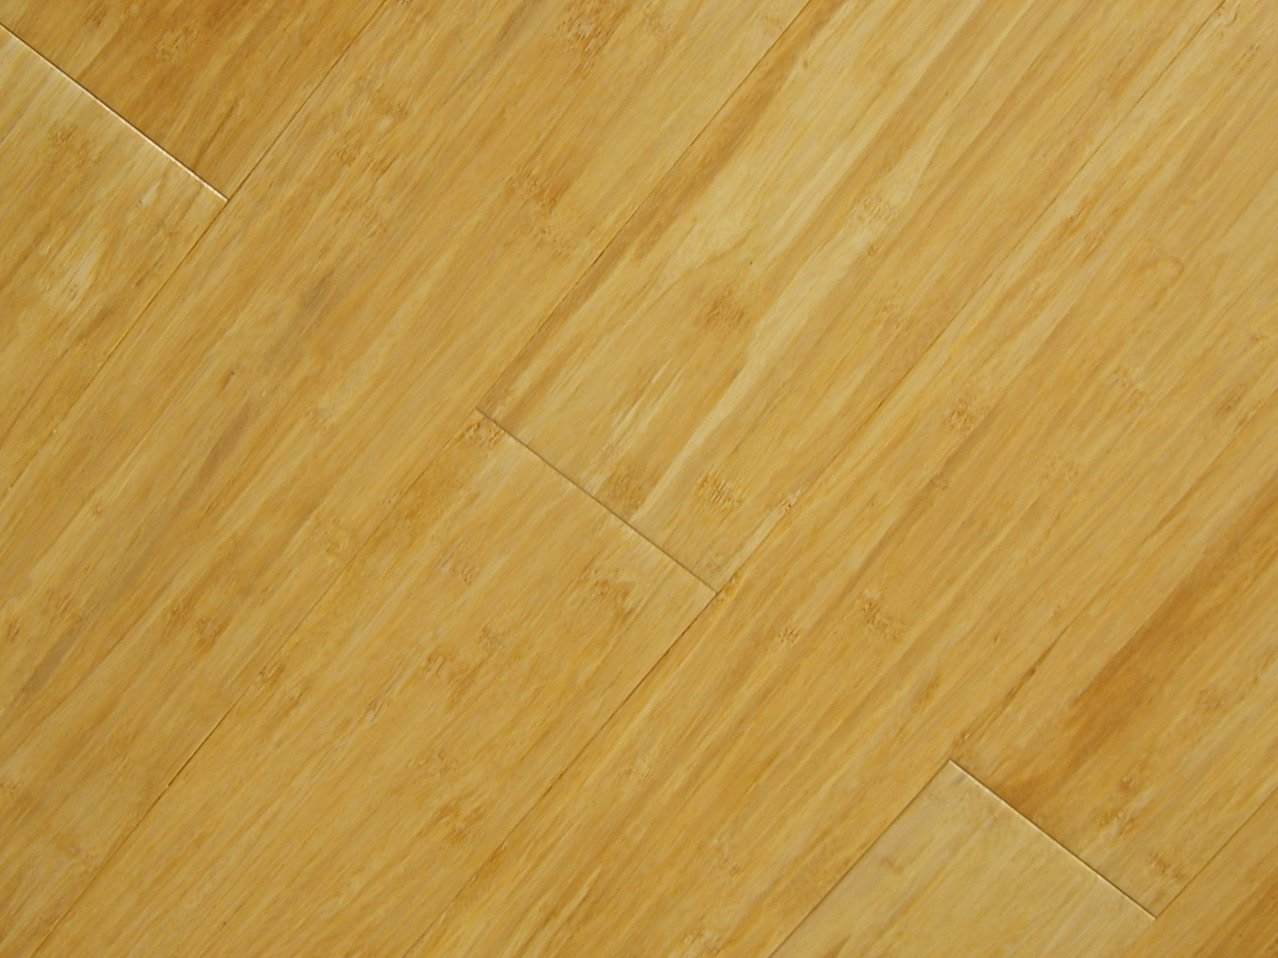 Sirocco 7 Mystery Bay Bar Stools Tiles Carpet Bamboo Flooring